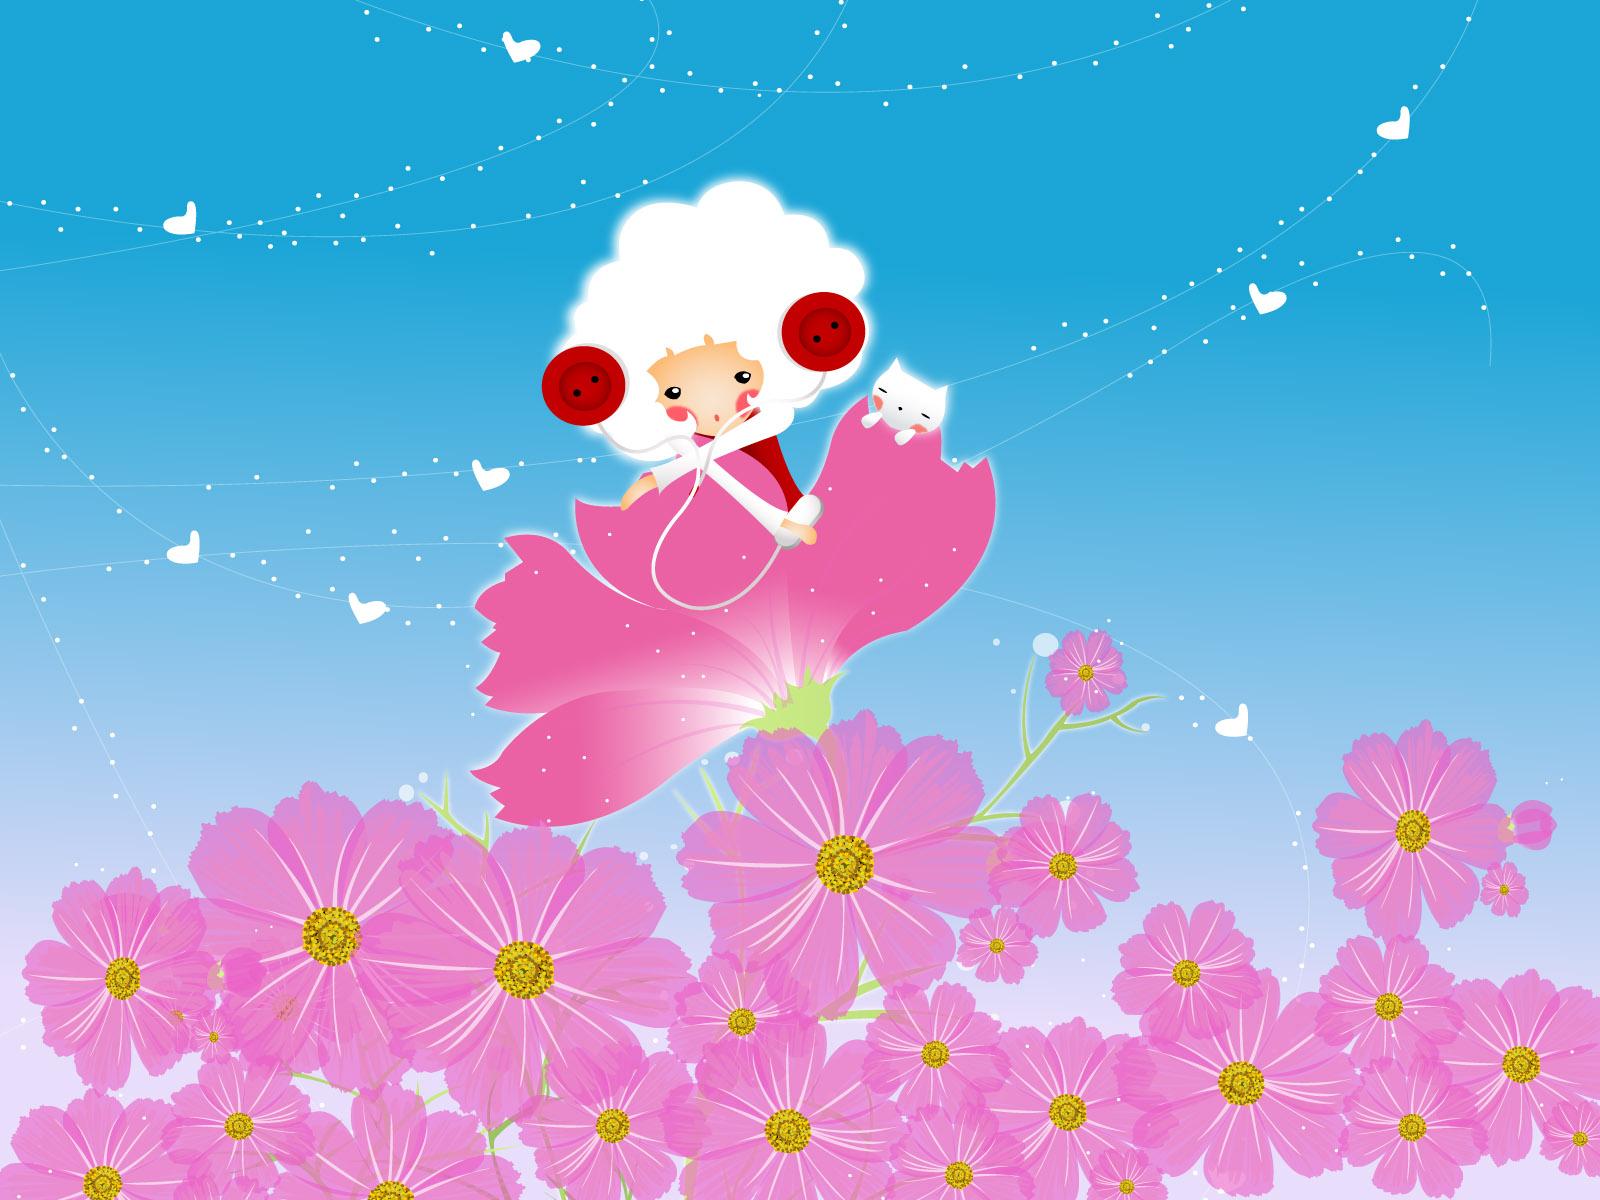 cute spring wallpaper cute spring wallpaper cute spring wallpaper cute 1600x1200